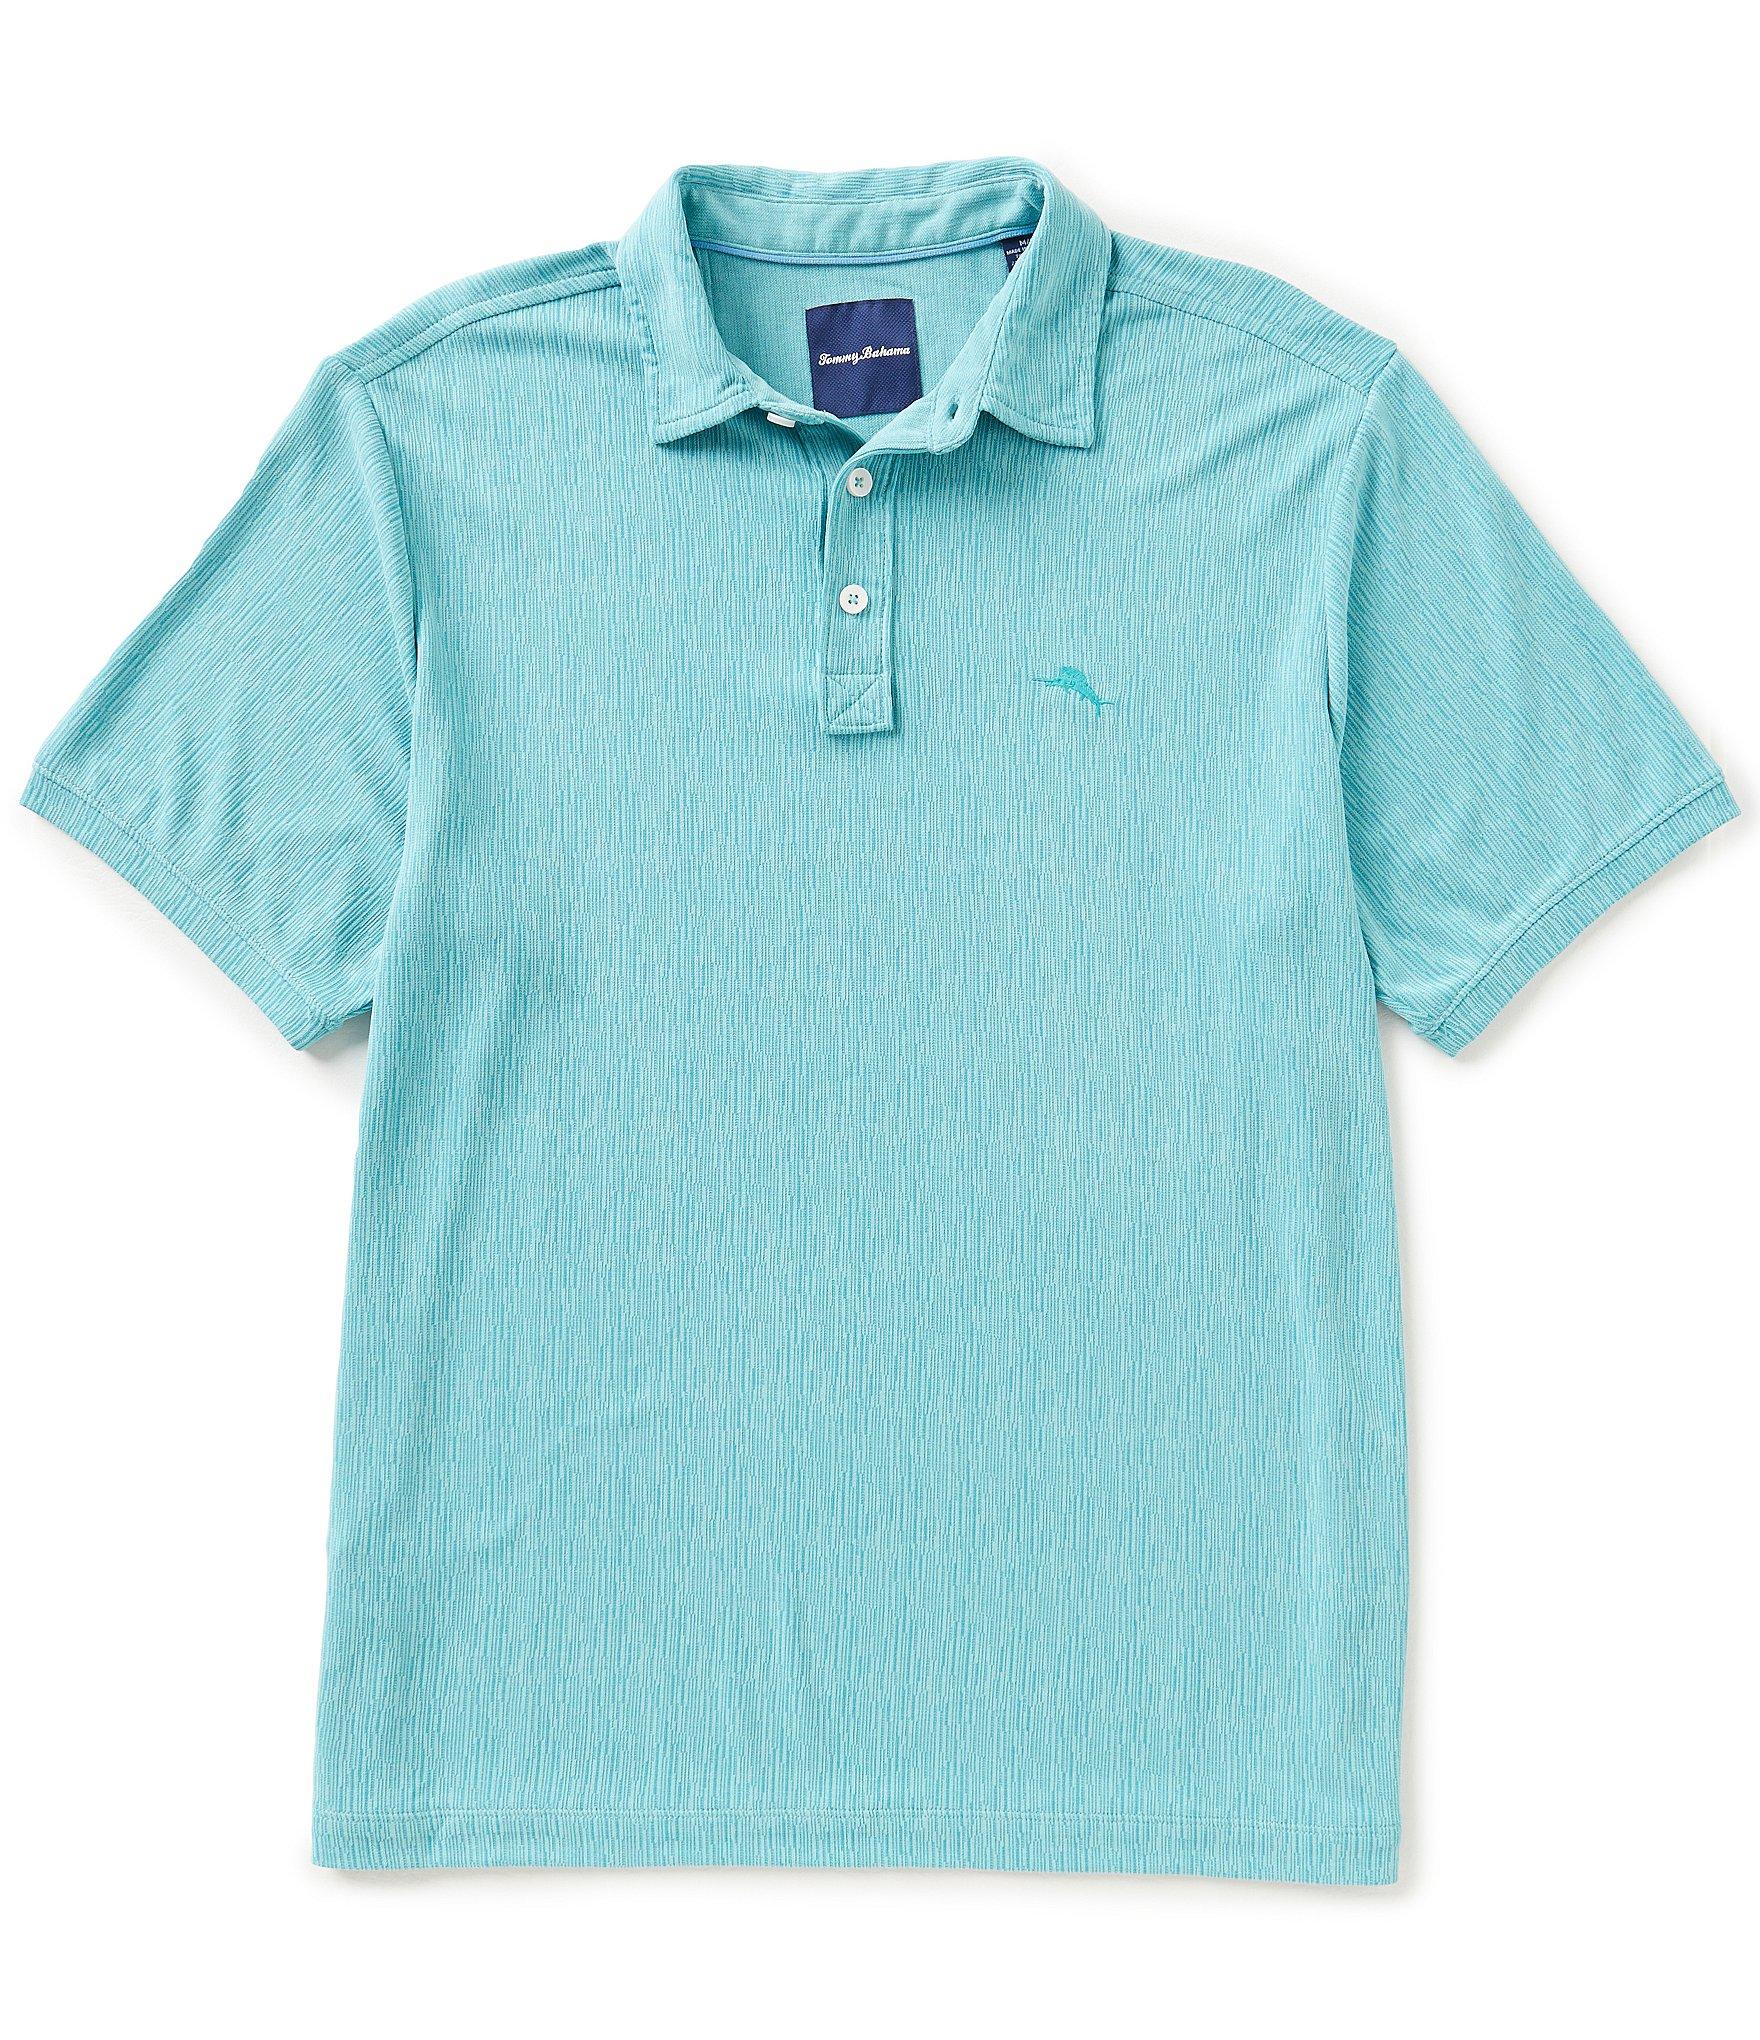 Tommy Bahama Dune Drifter Spectator Polo Shirt | Dillards